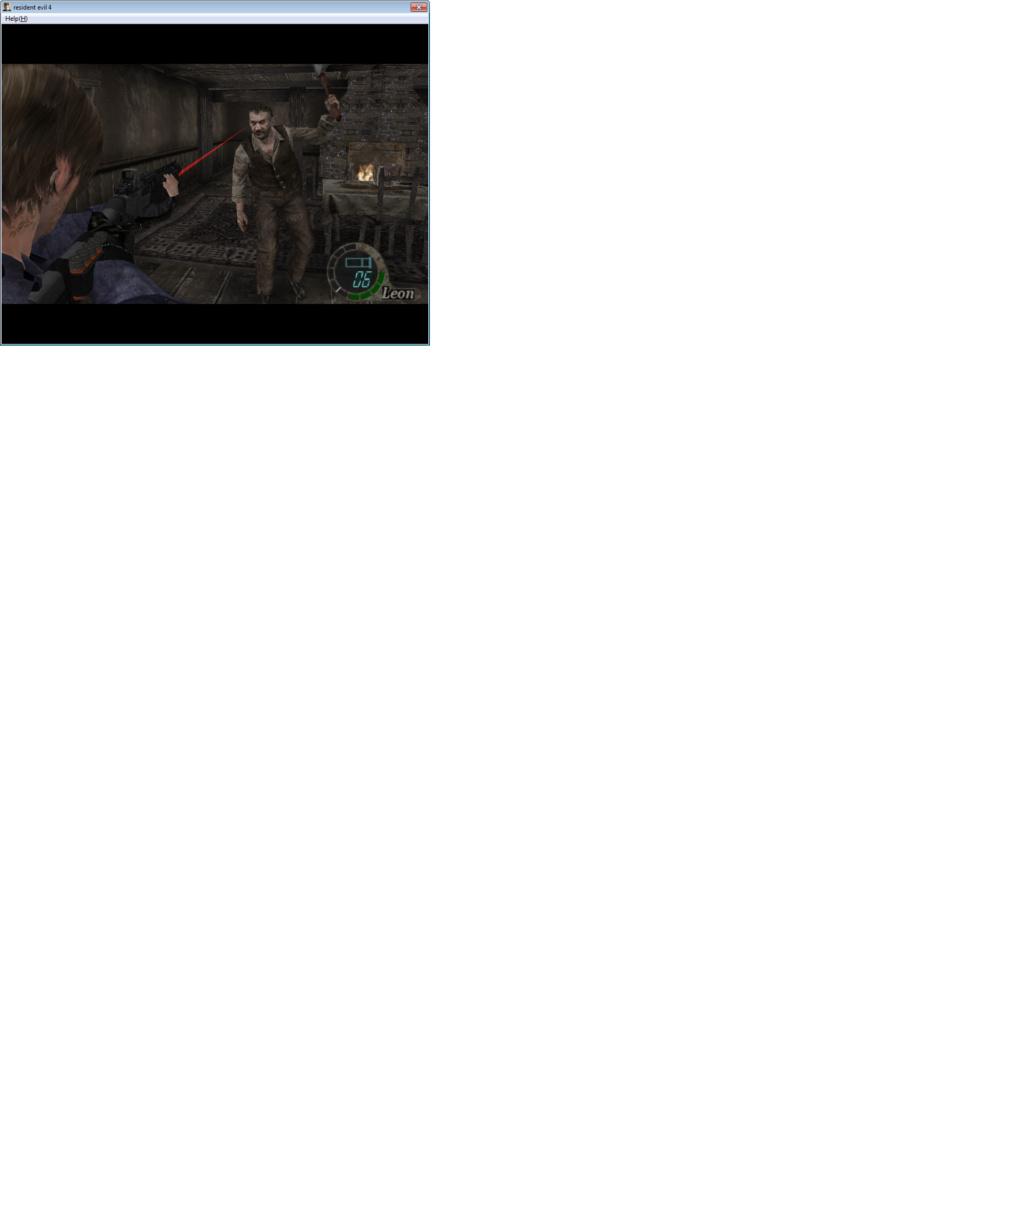 Super Mod de Resident evil 6 para Resident evil 4 y nuevo equipo Captur12